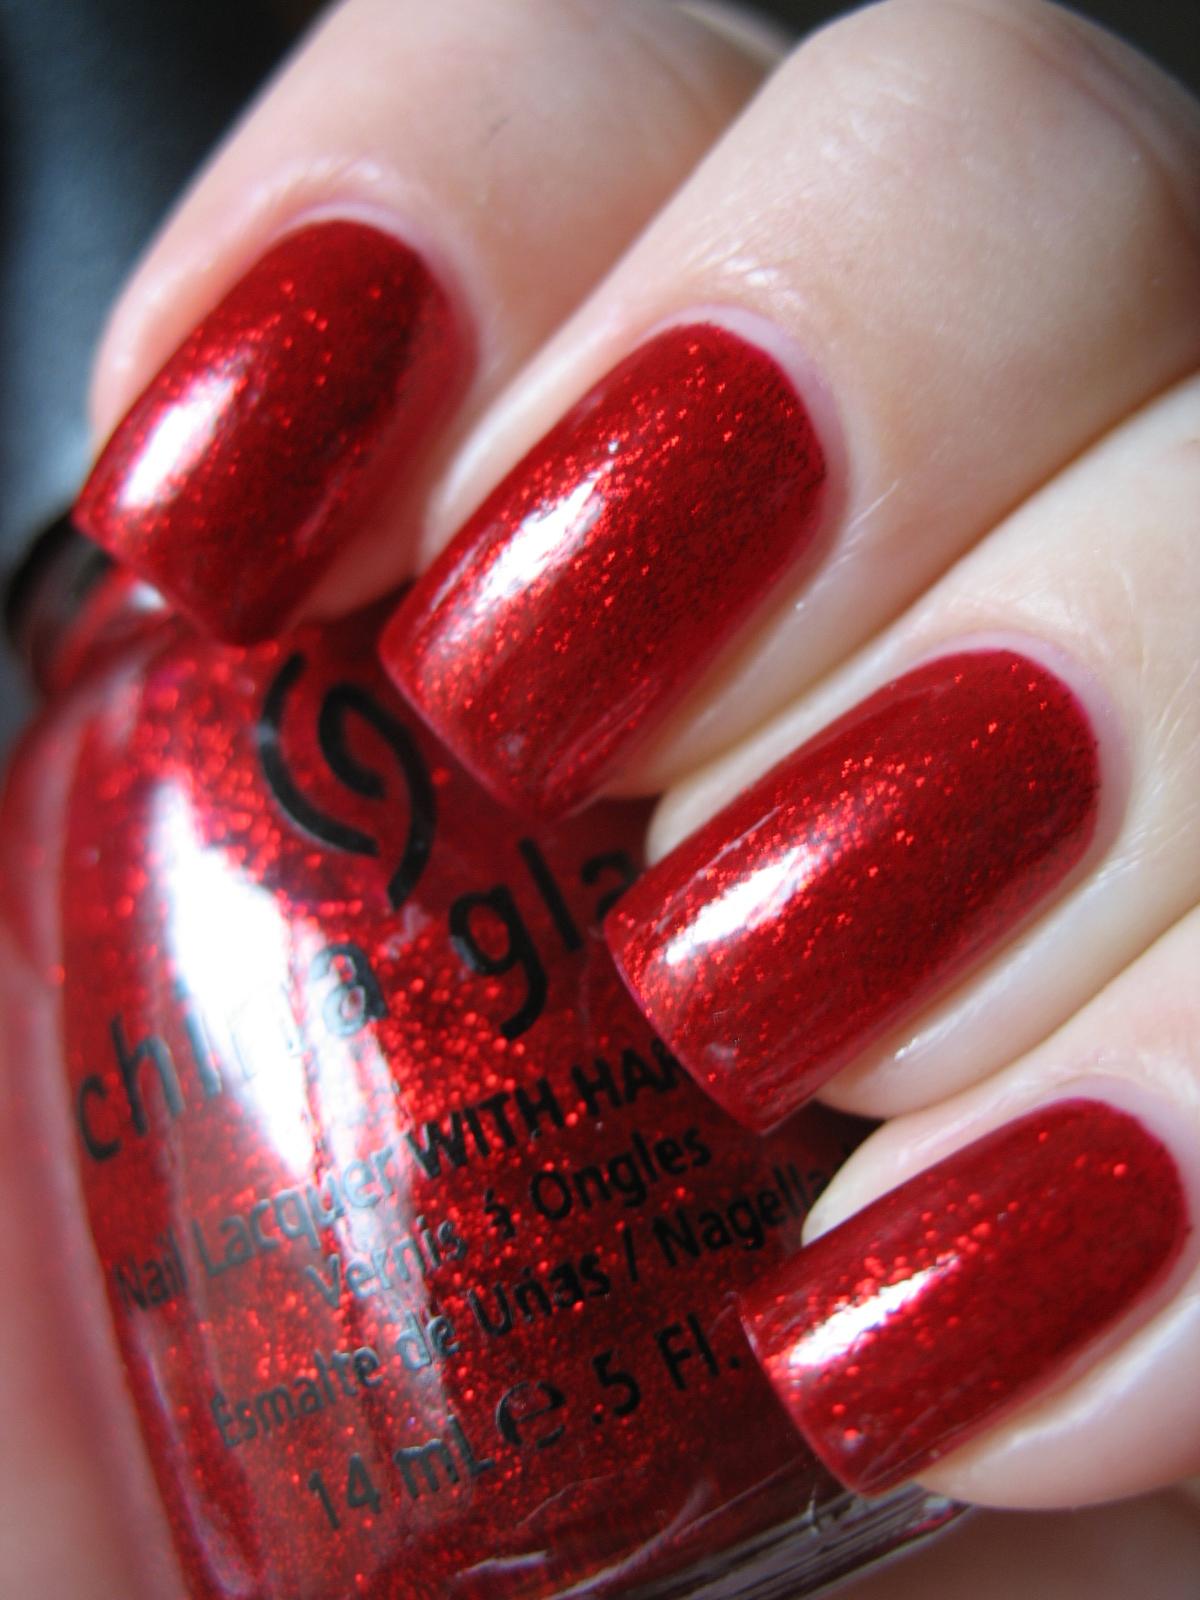 China Glaze Presenta Crakle Glaze: Kiss My Acetone: China Glaze Ruby Pumps